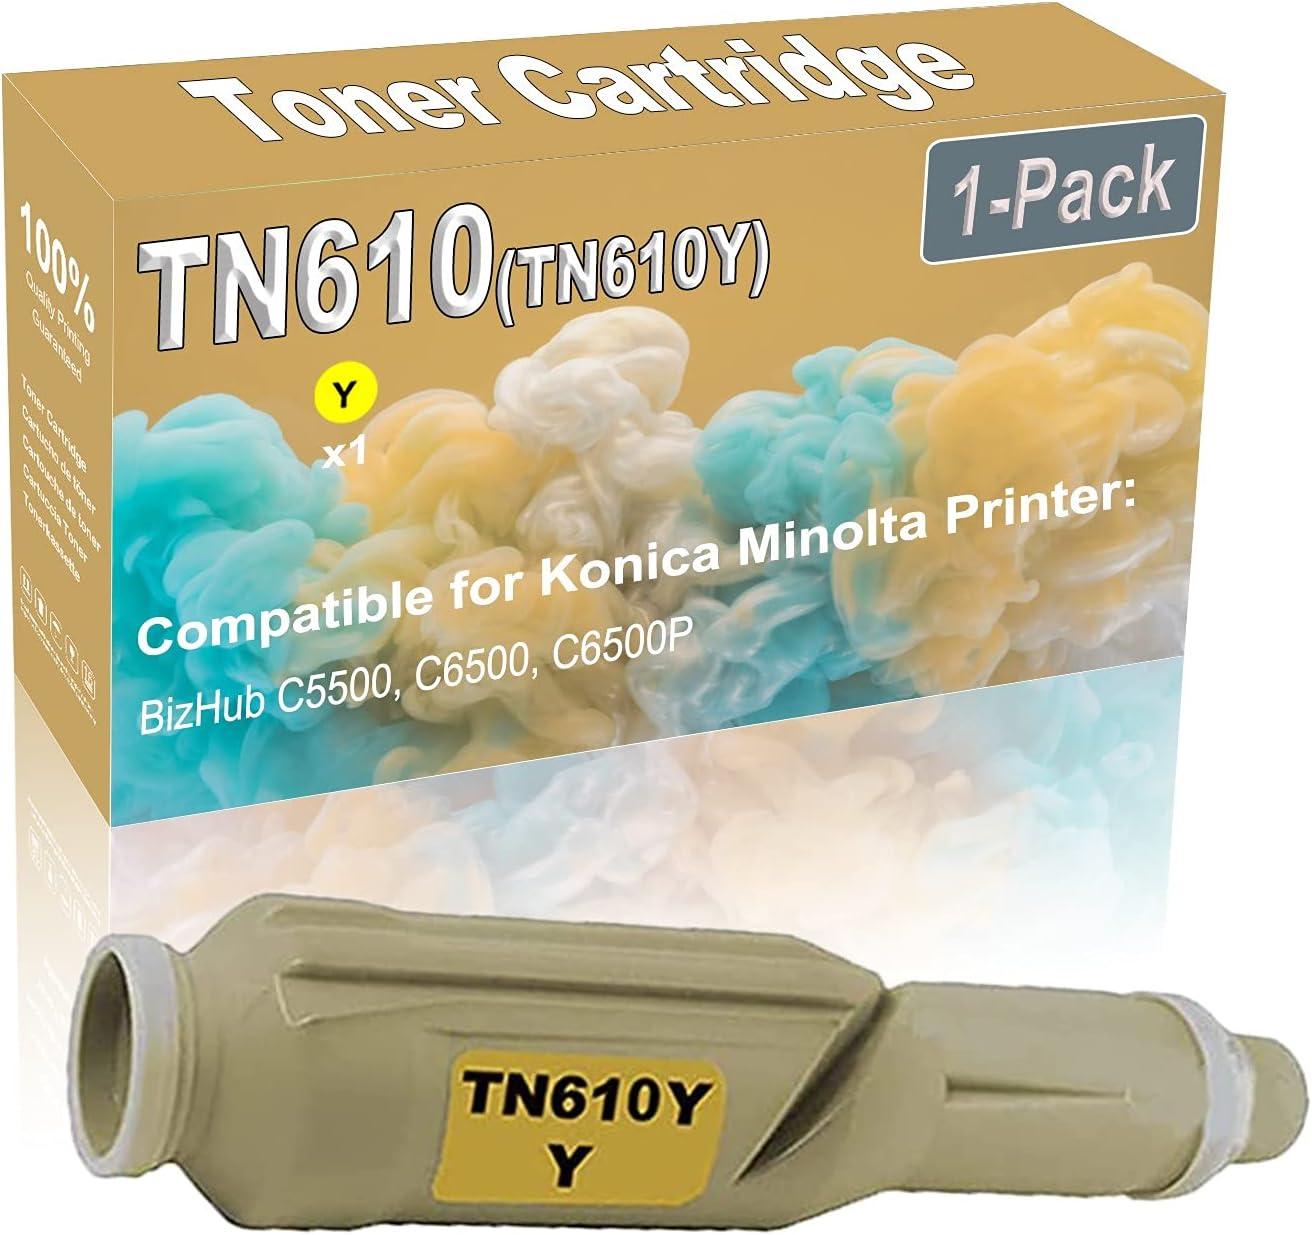 1-Pack (Yellow) Compatible High Yield TN610 (TN610Y) Printer Toner Cartridge use for Konica Minolta BizHub C5500 C6500 Printers